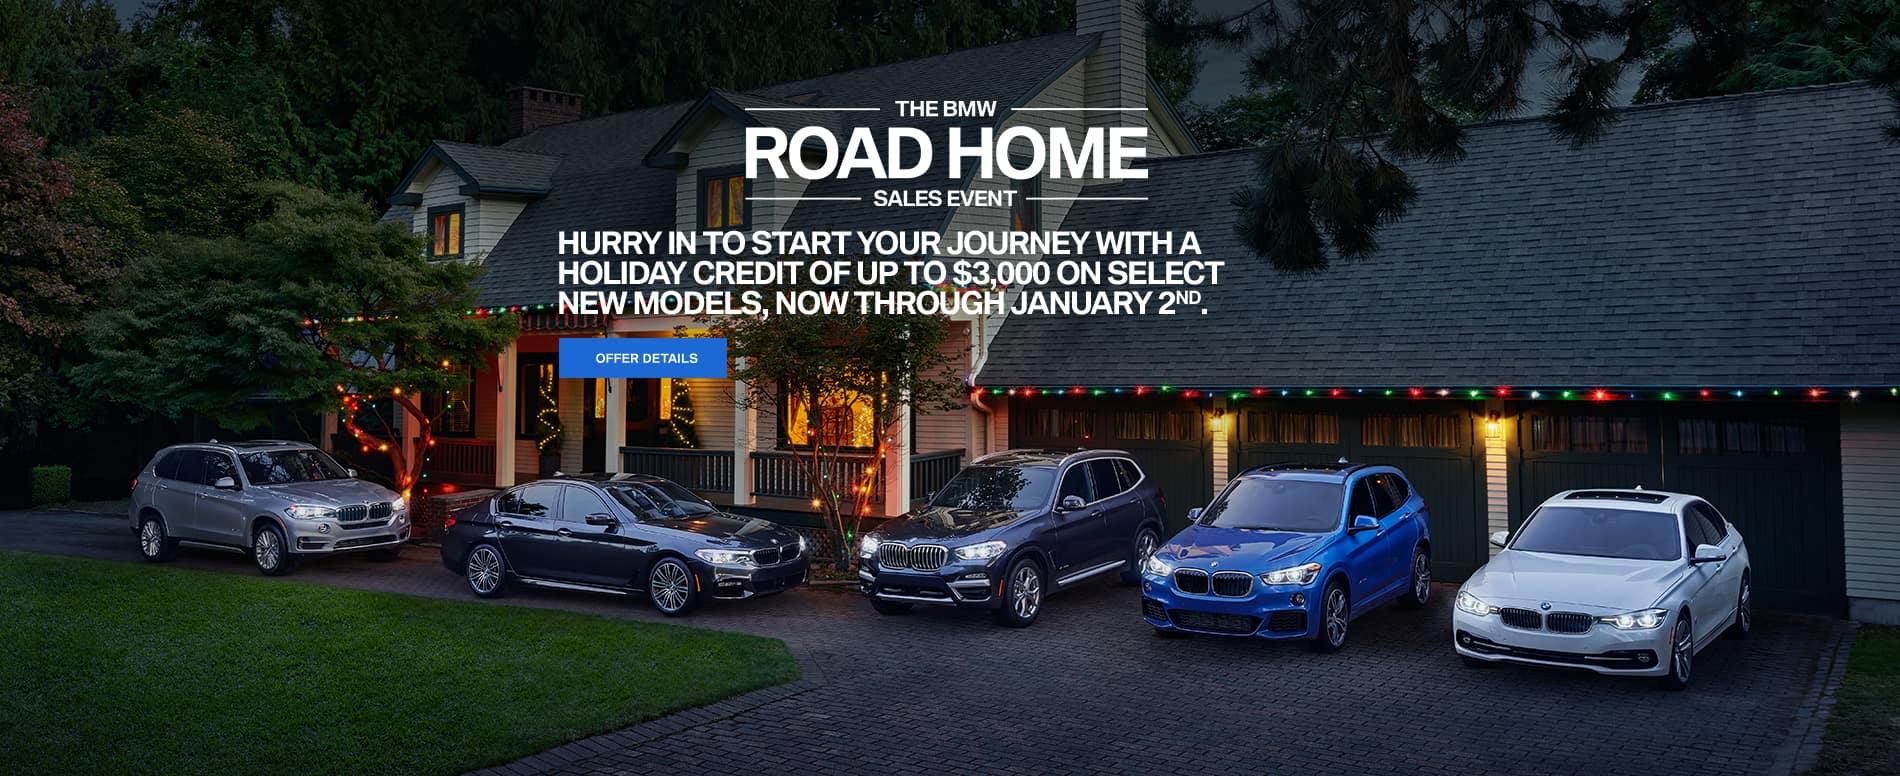 BMW_YEE_FMA_National_Offer_$3000Credit